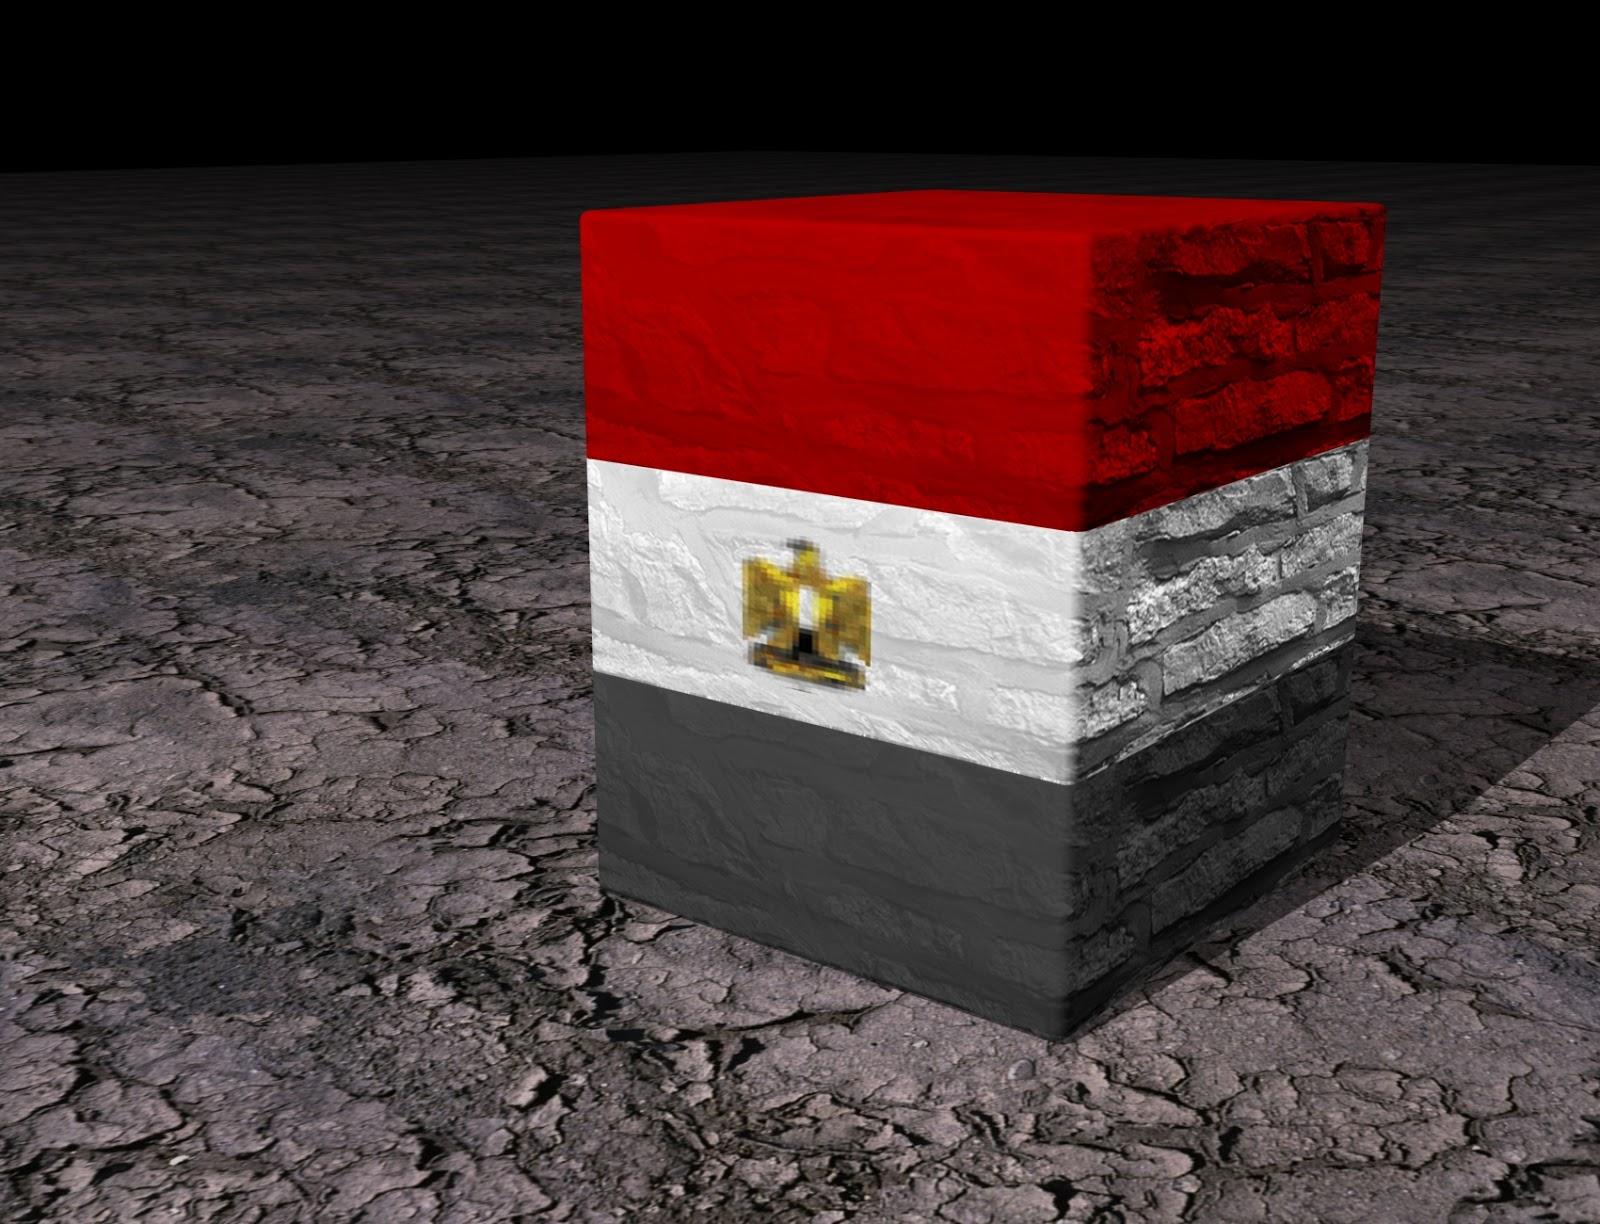 صور علم مصر (3)